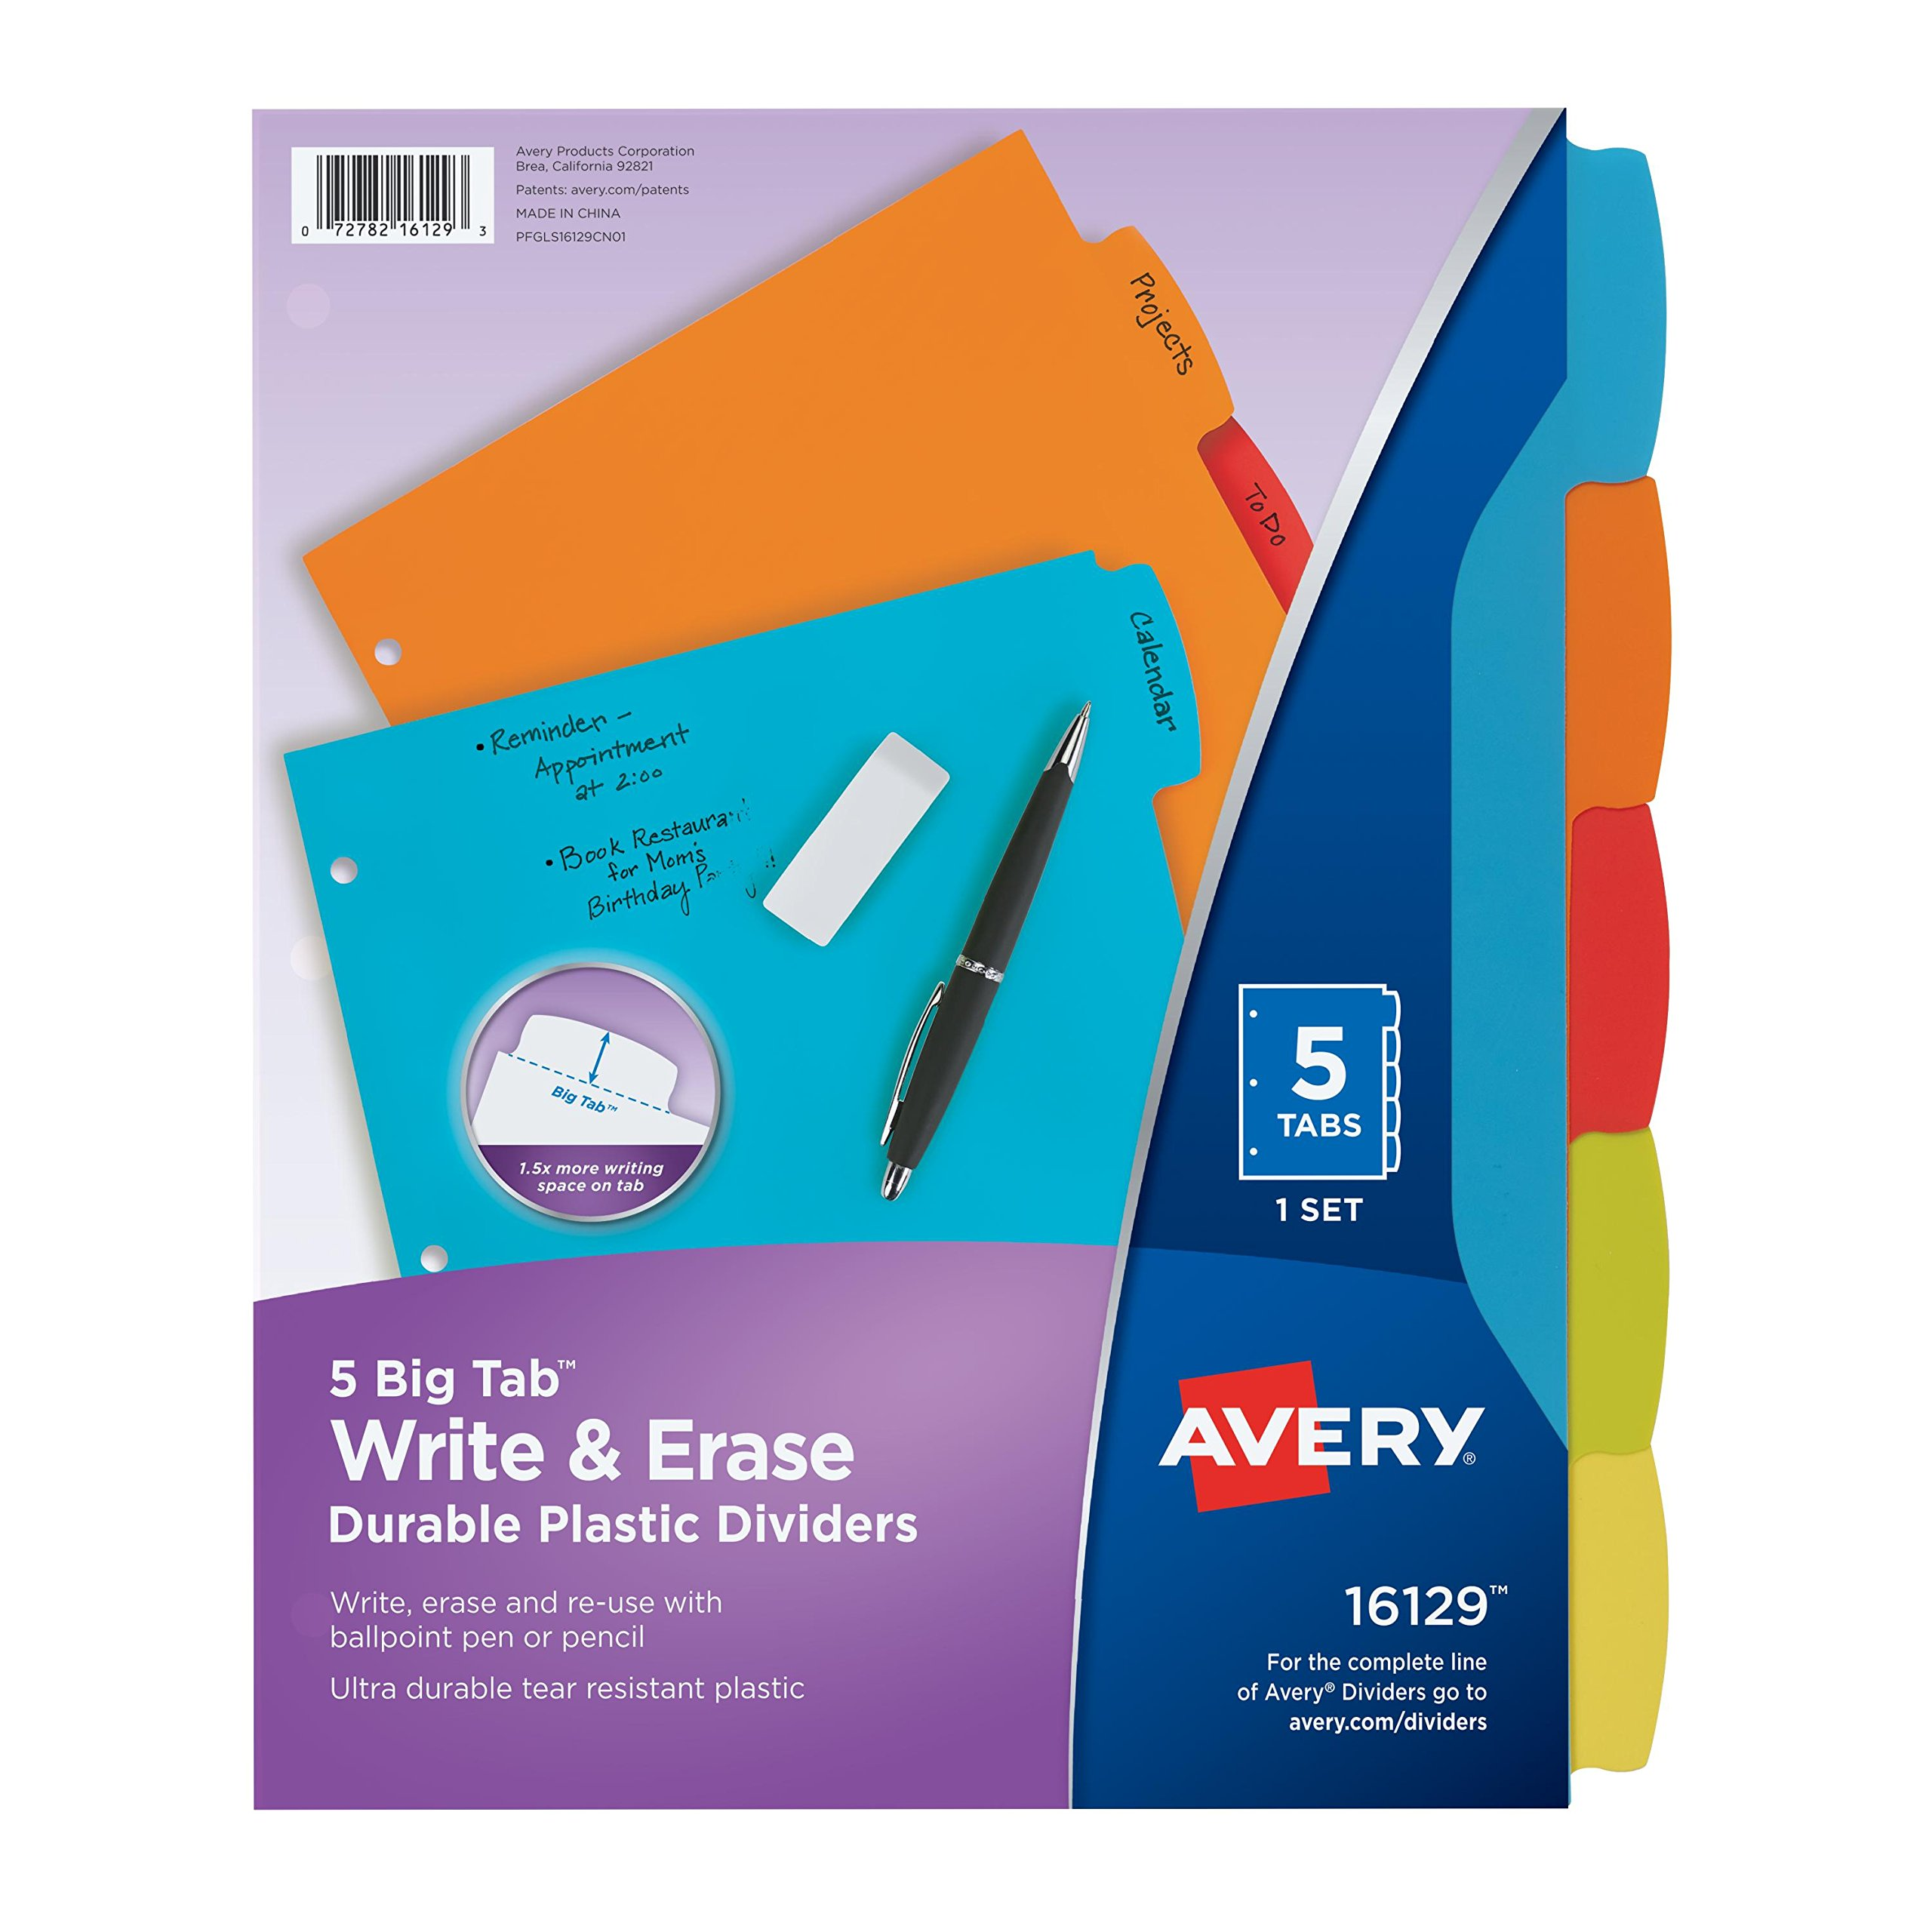 Avery Big Tab Write & Erase Durable Plastic Dividers, 5 MulticolorTabs, 1 Set (16129)